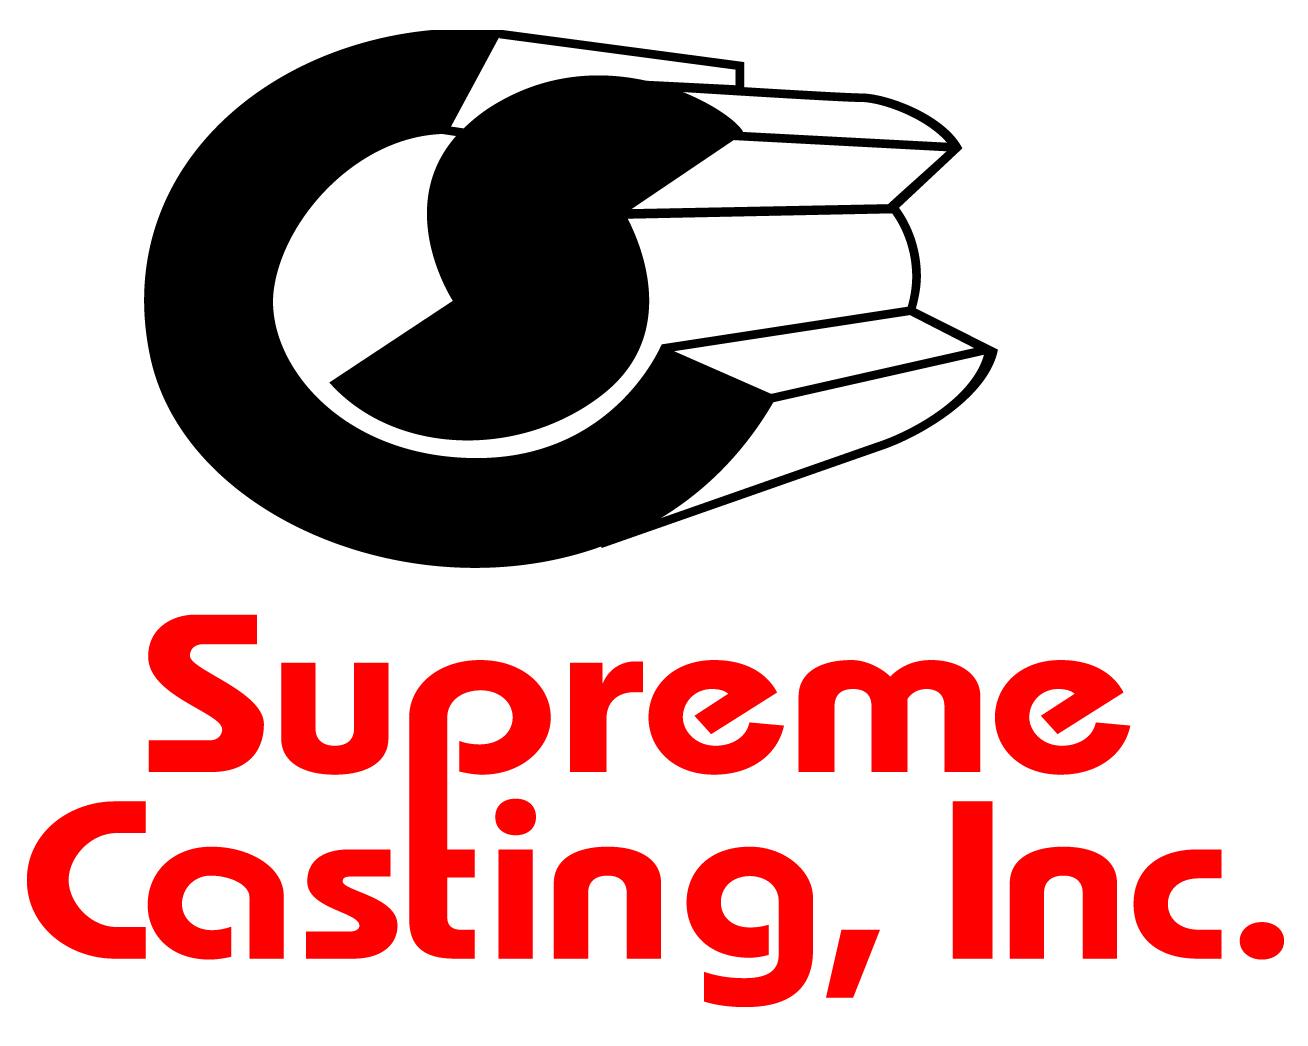 SupremeCasting